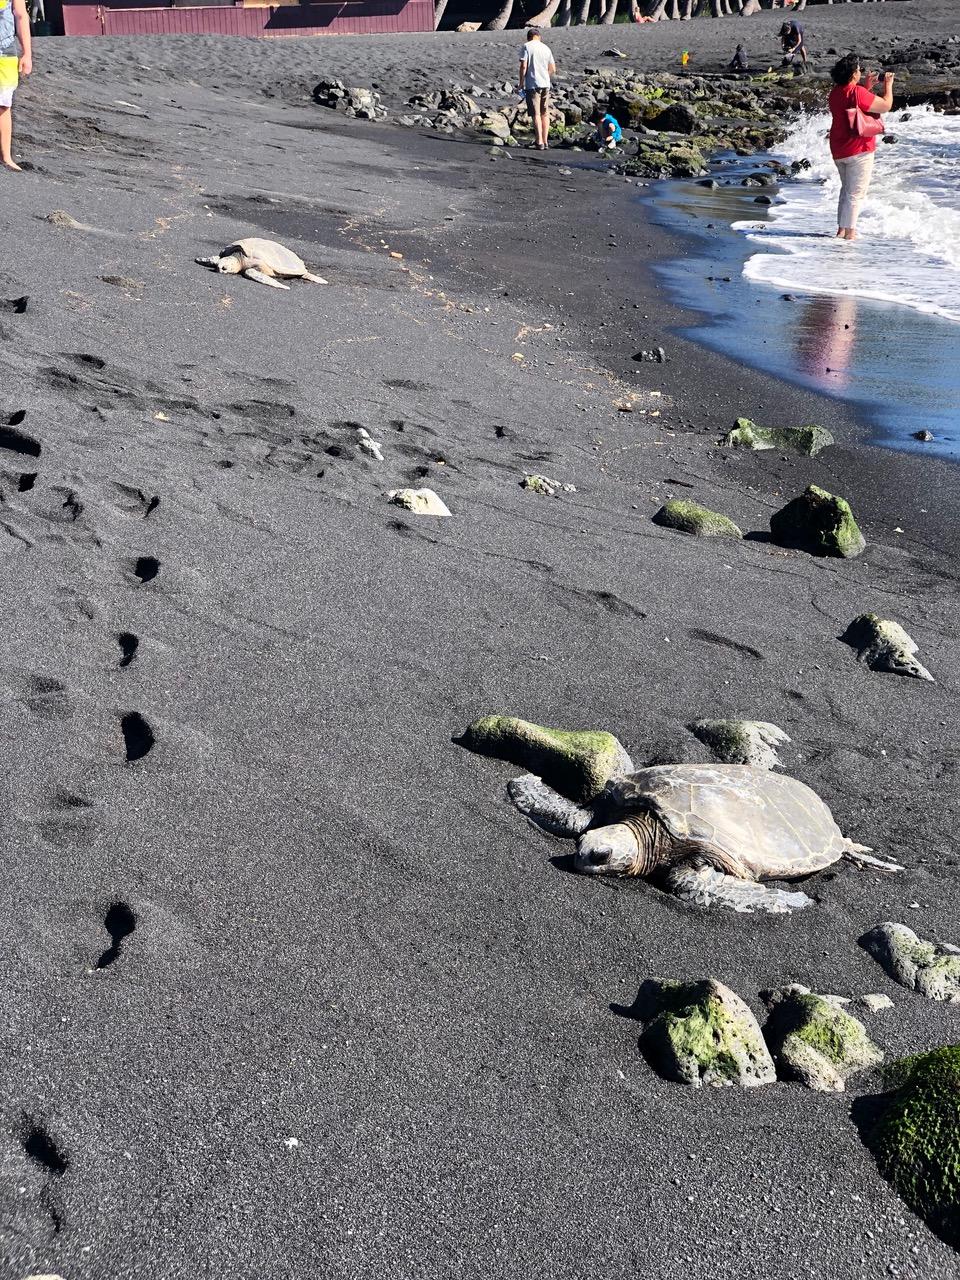 ...green turtles...